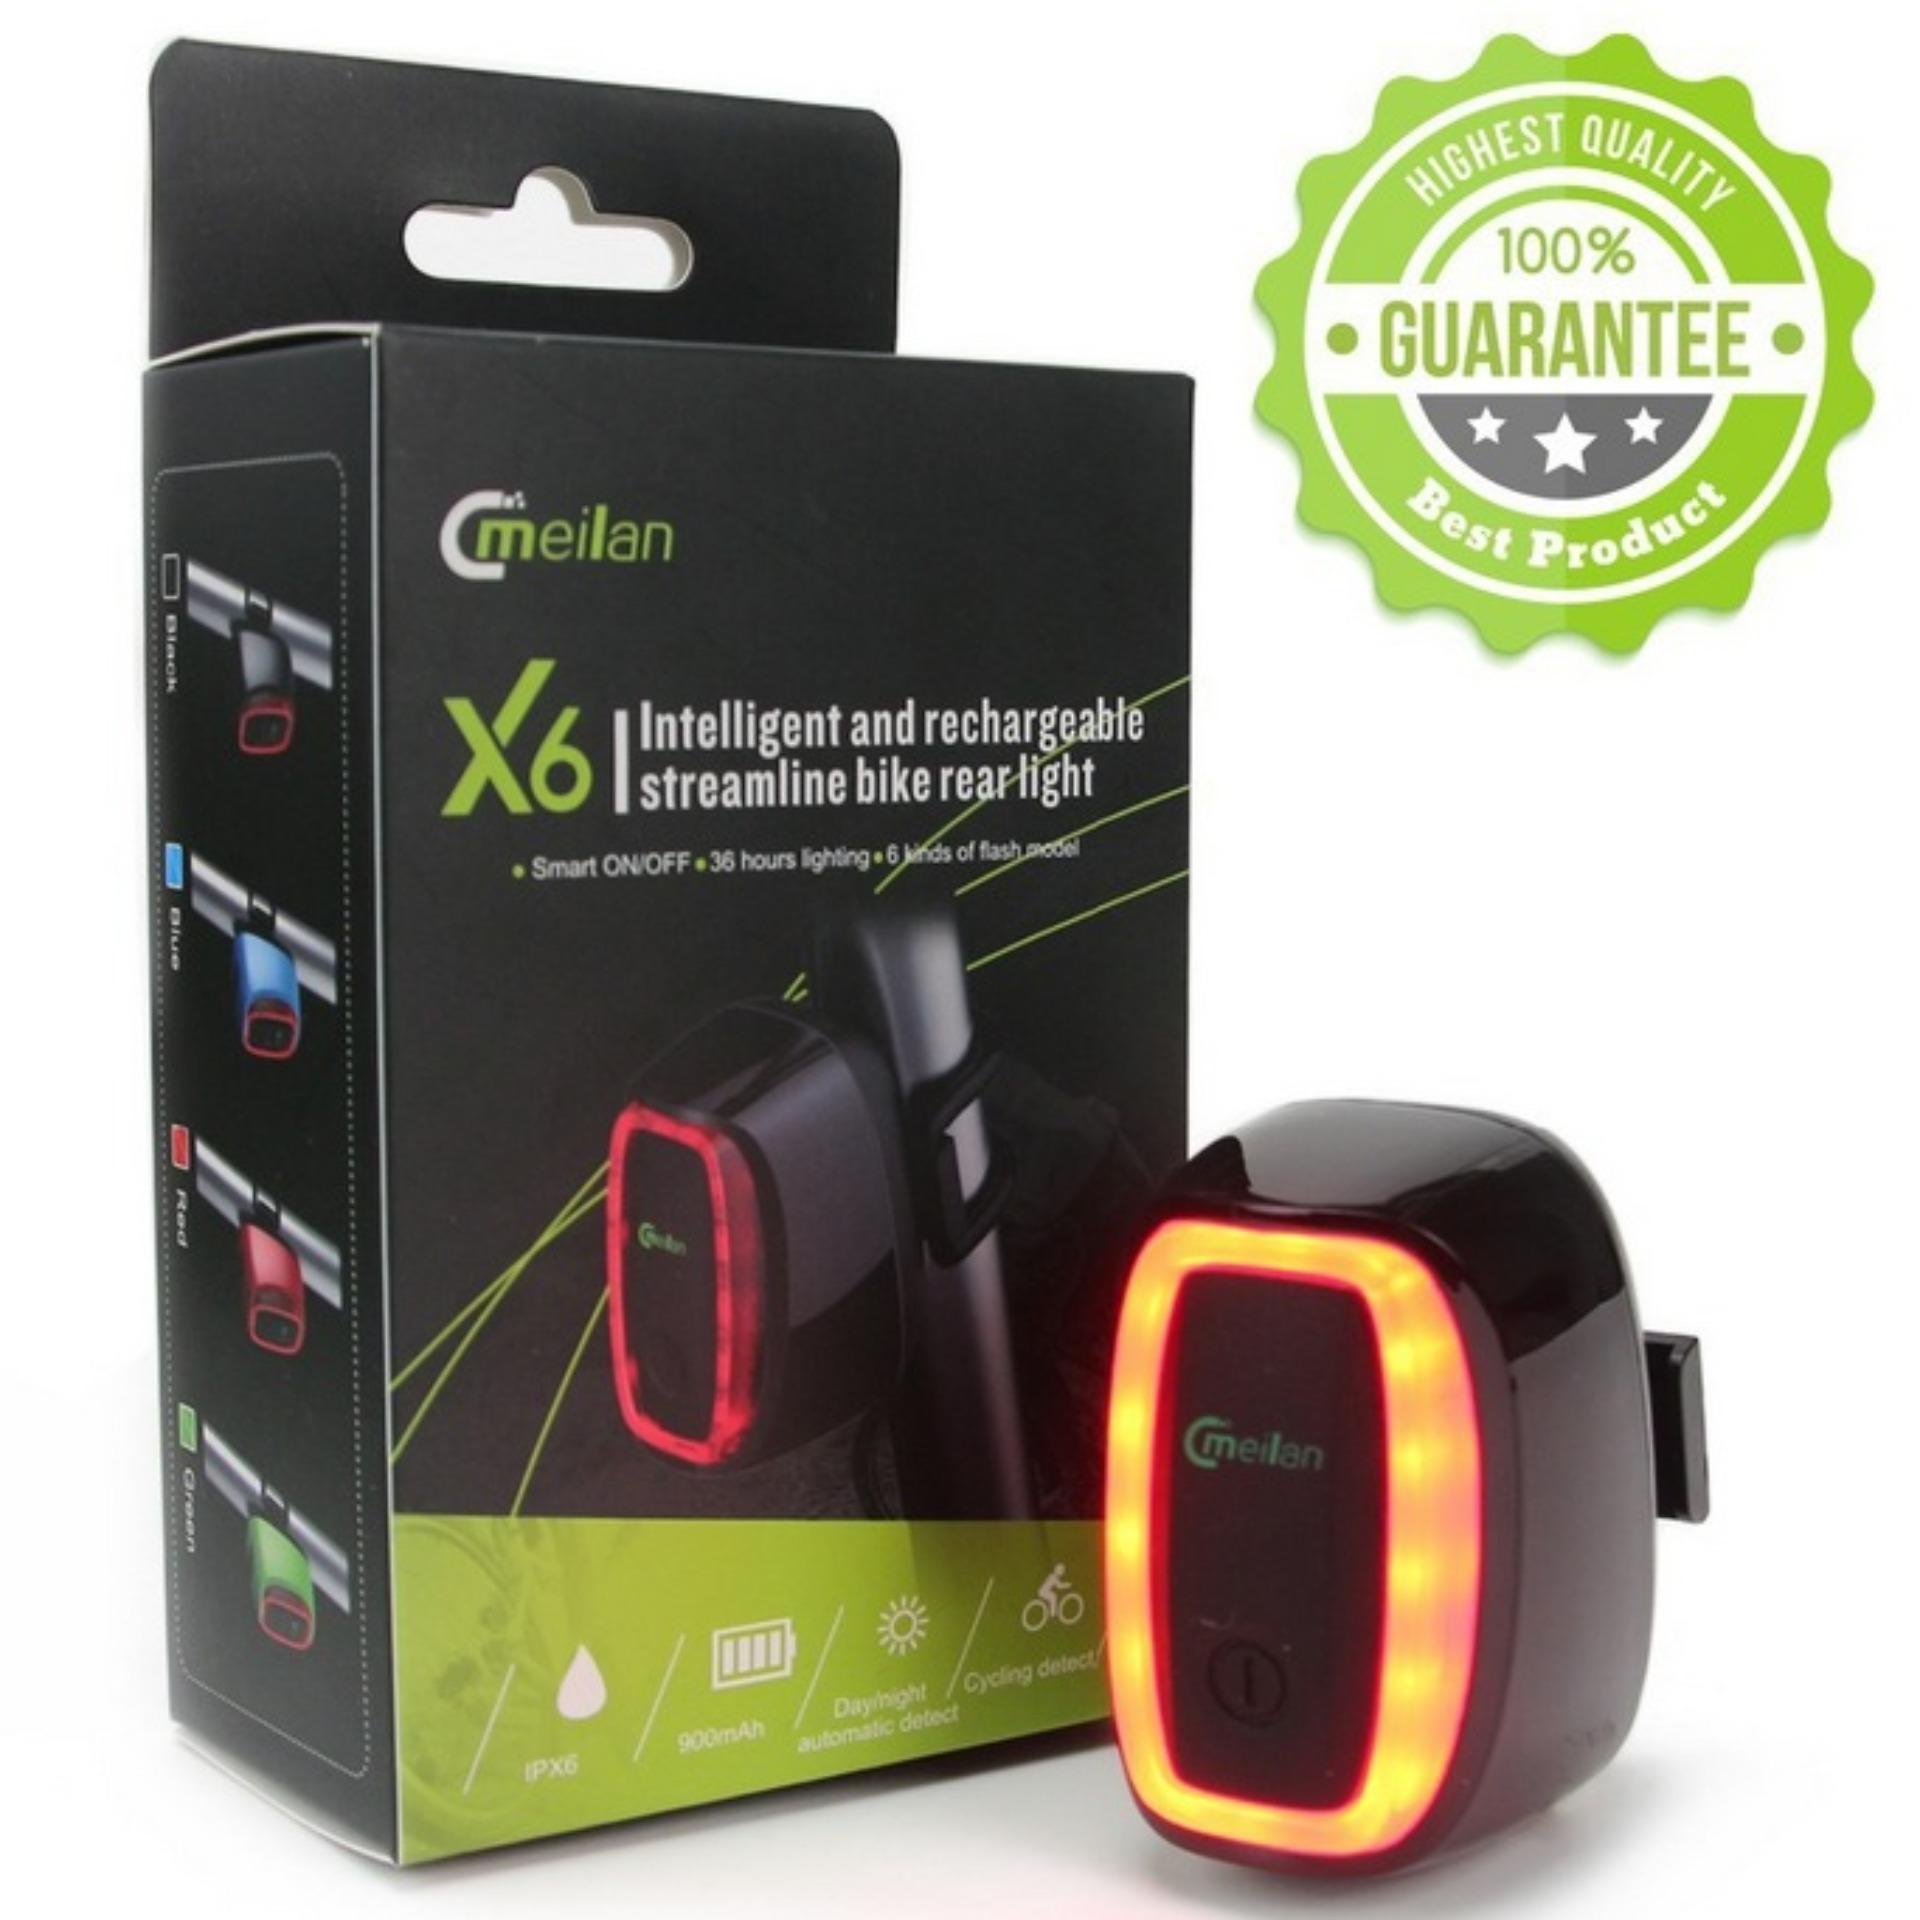 (Impor) isi ulang lampu sepeda USB Smart Sensor getaran IPX6Waterproof penyewaan lampu belakang 7